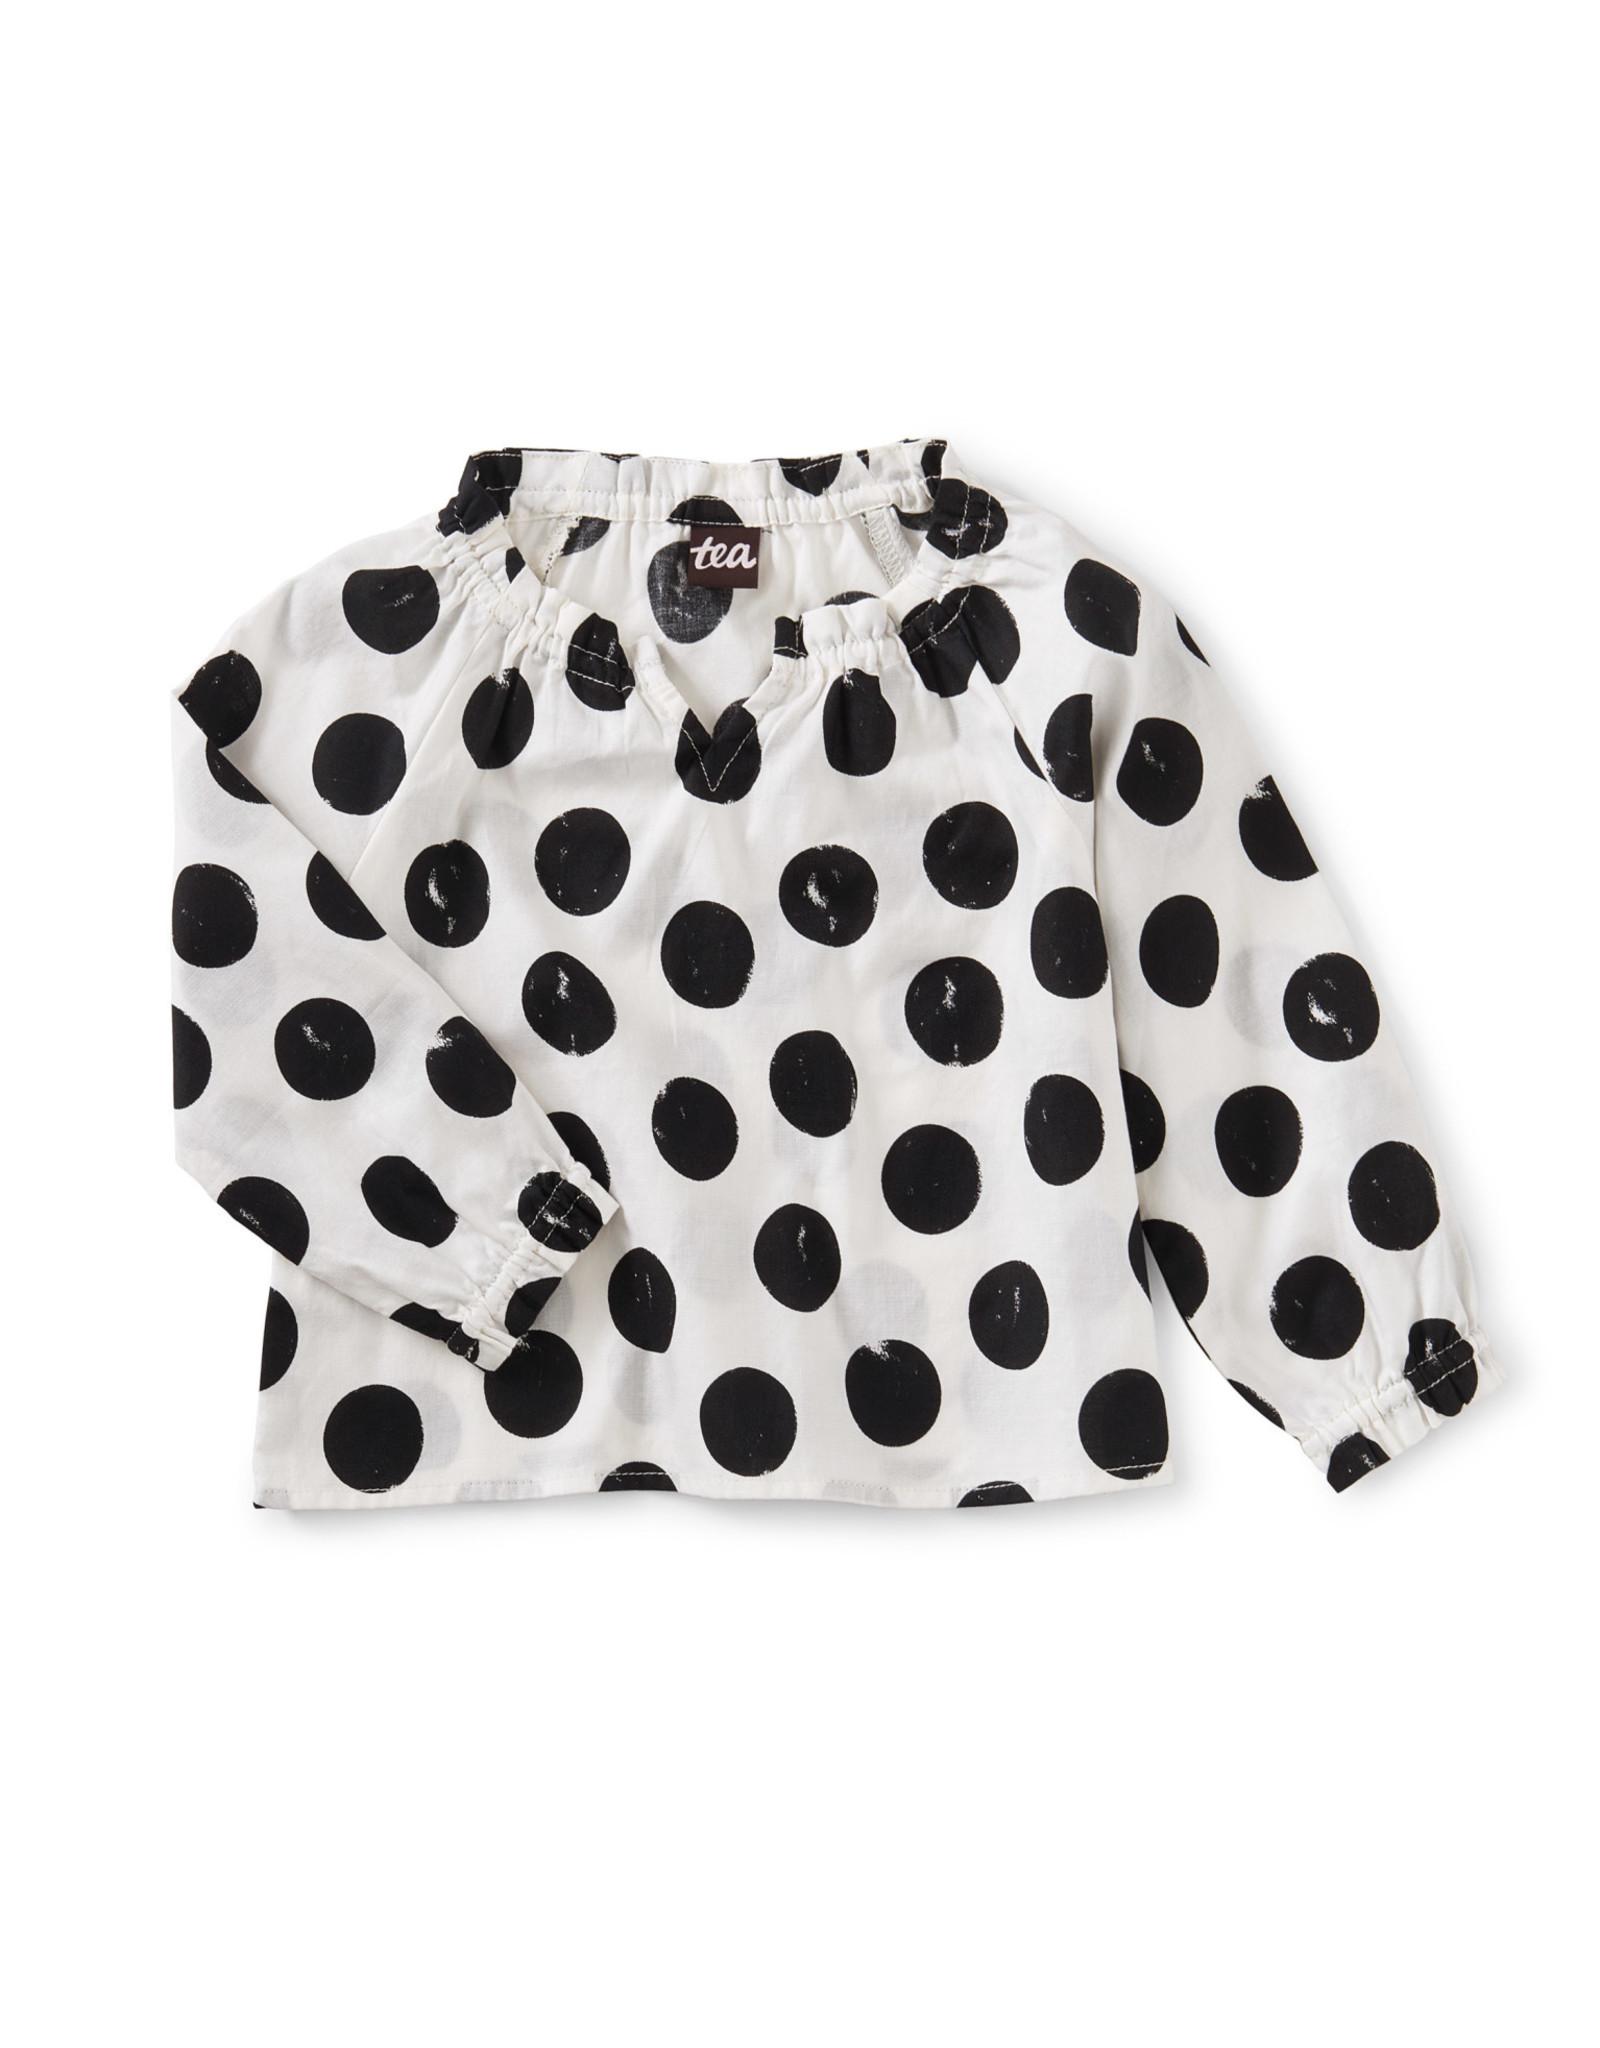 Tea Ruffle Sleeve Sweetie Top, Stamped Dots